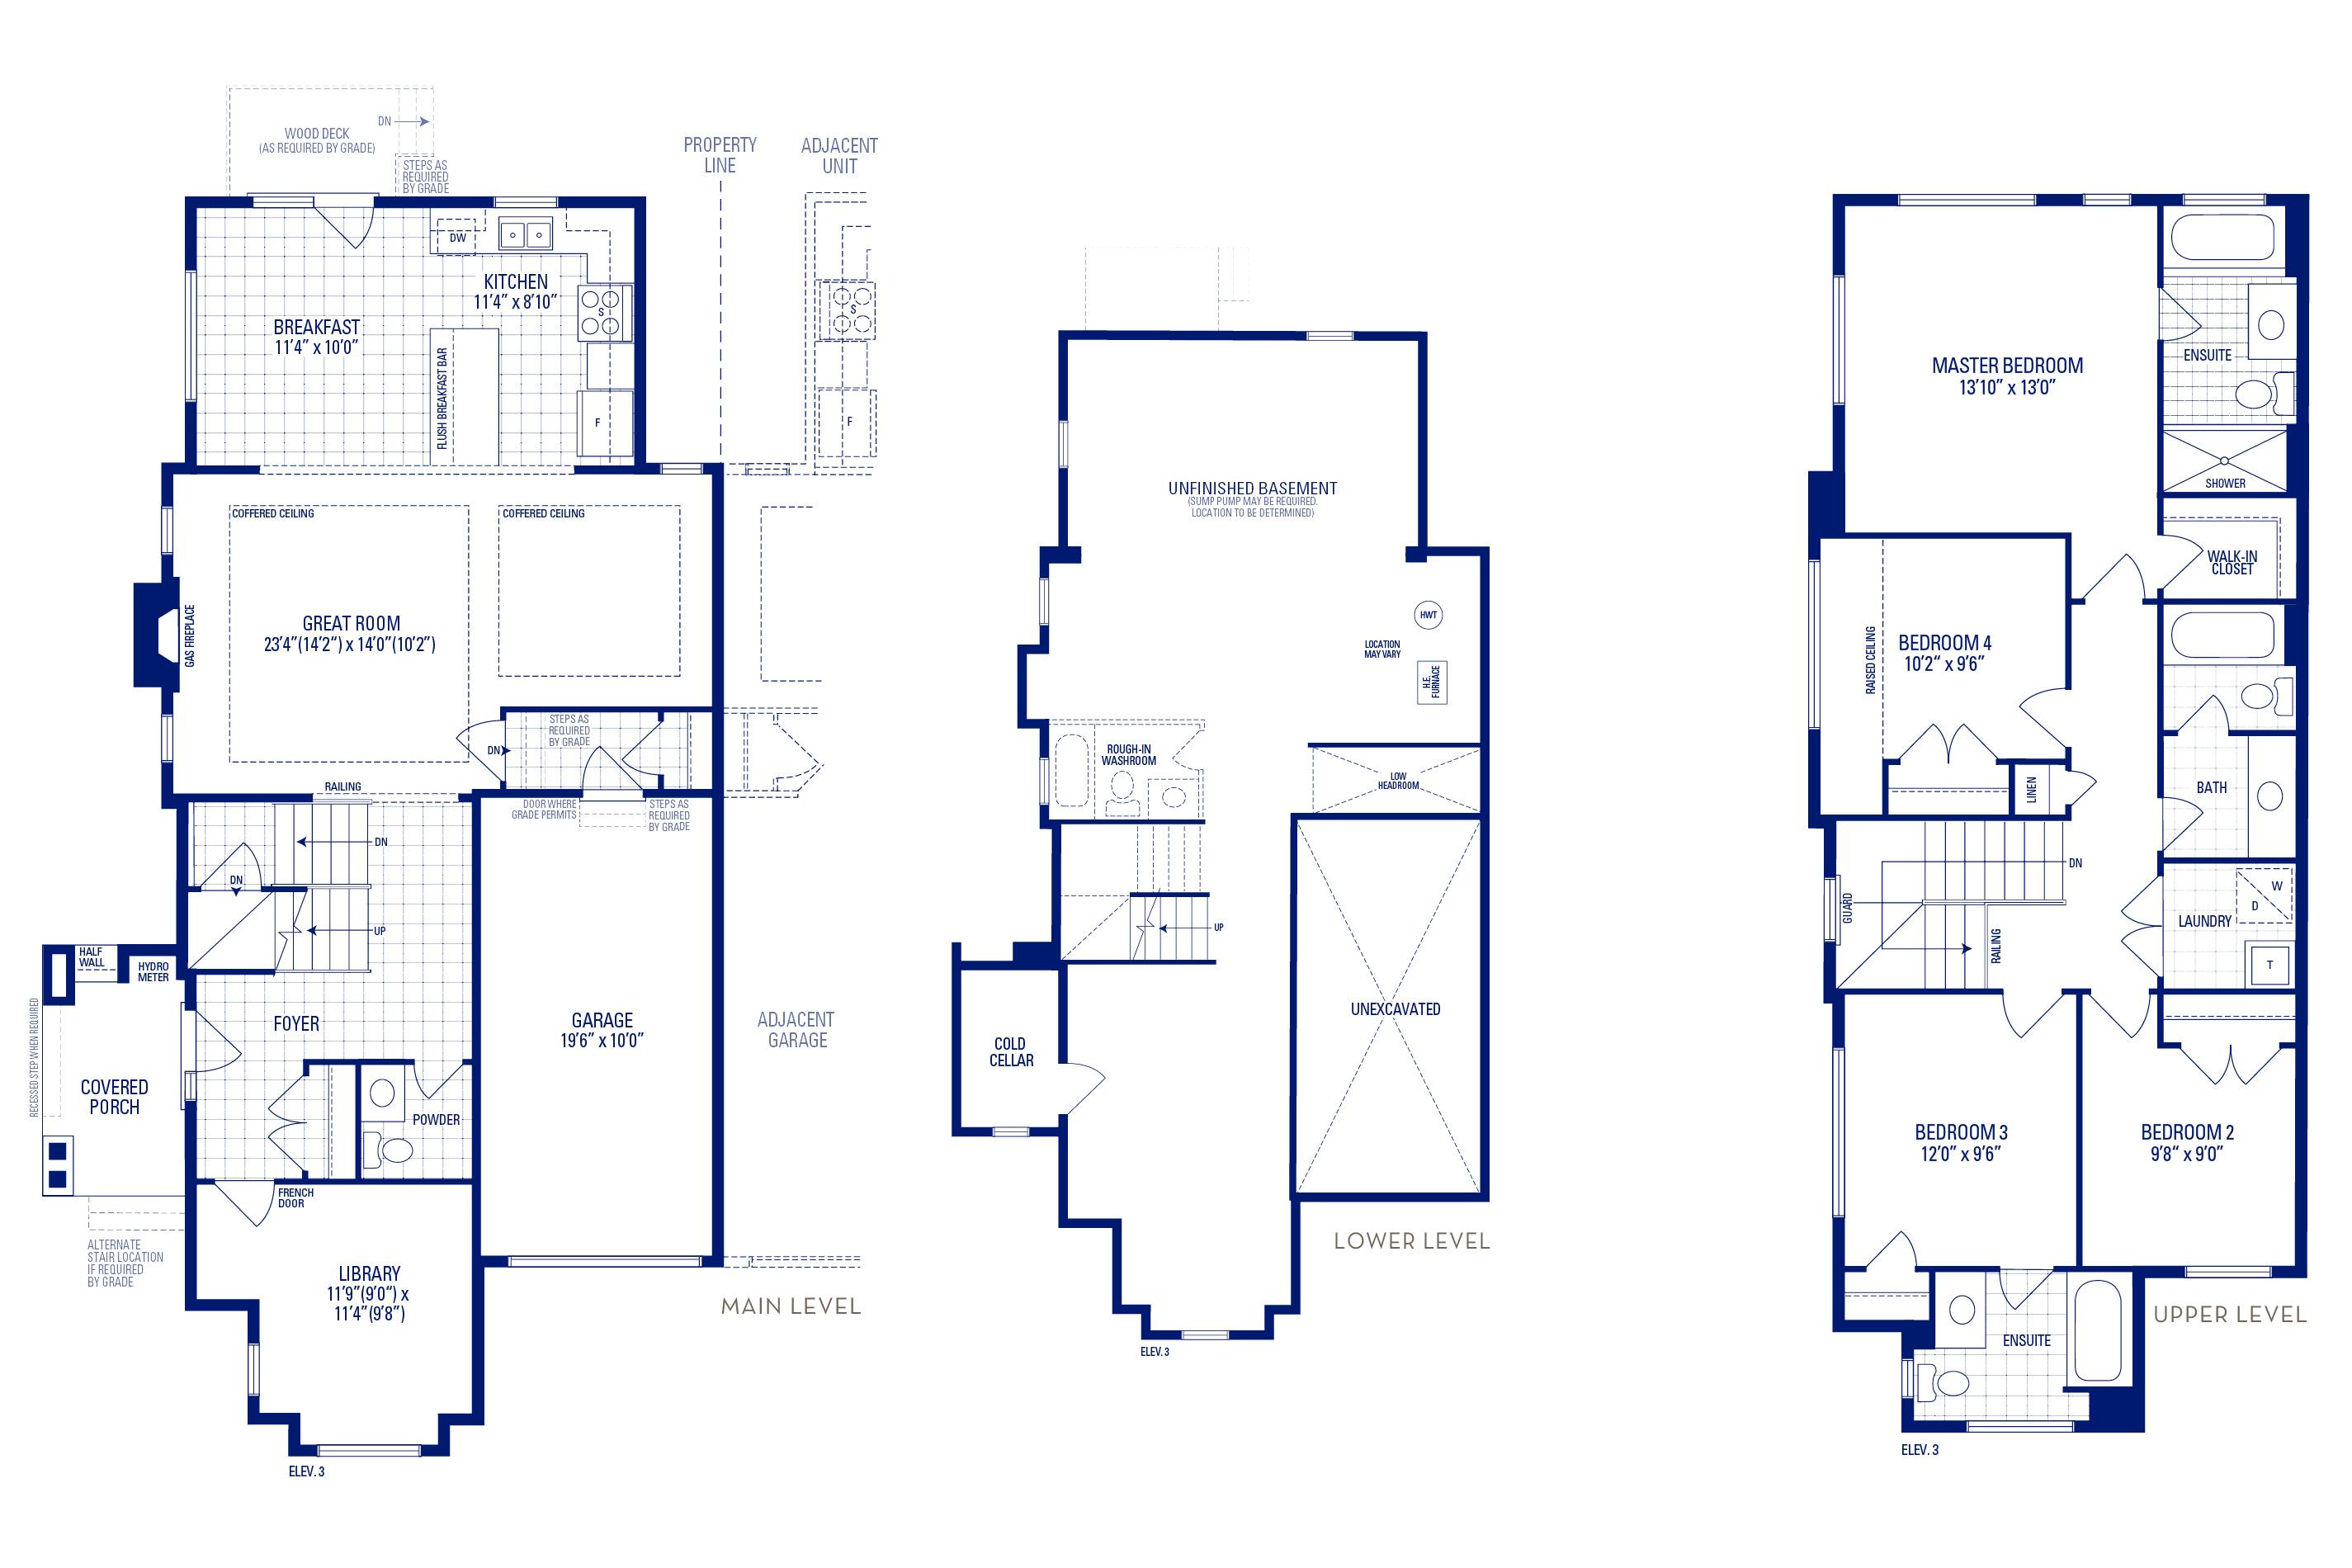 Newberry 12 Elev. 3 Floorplan